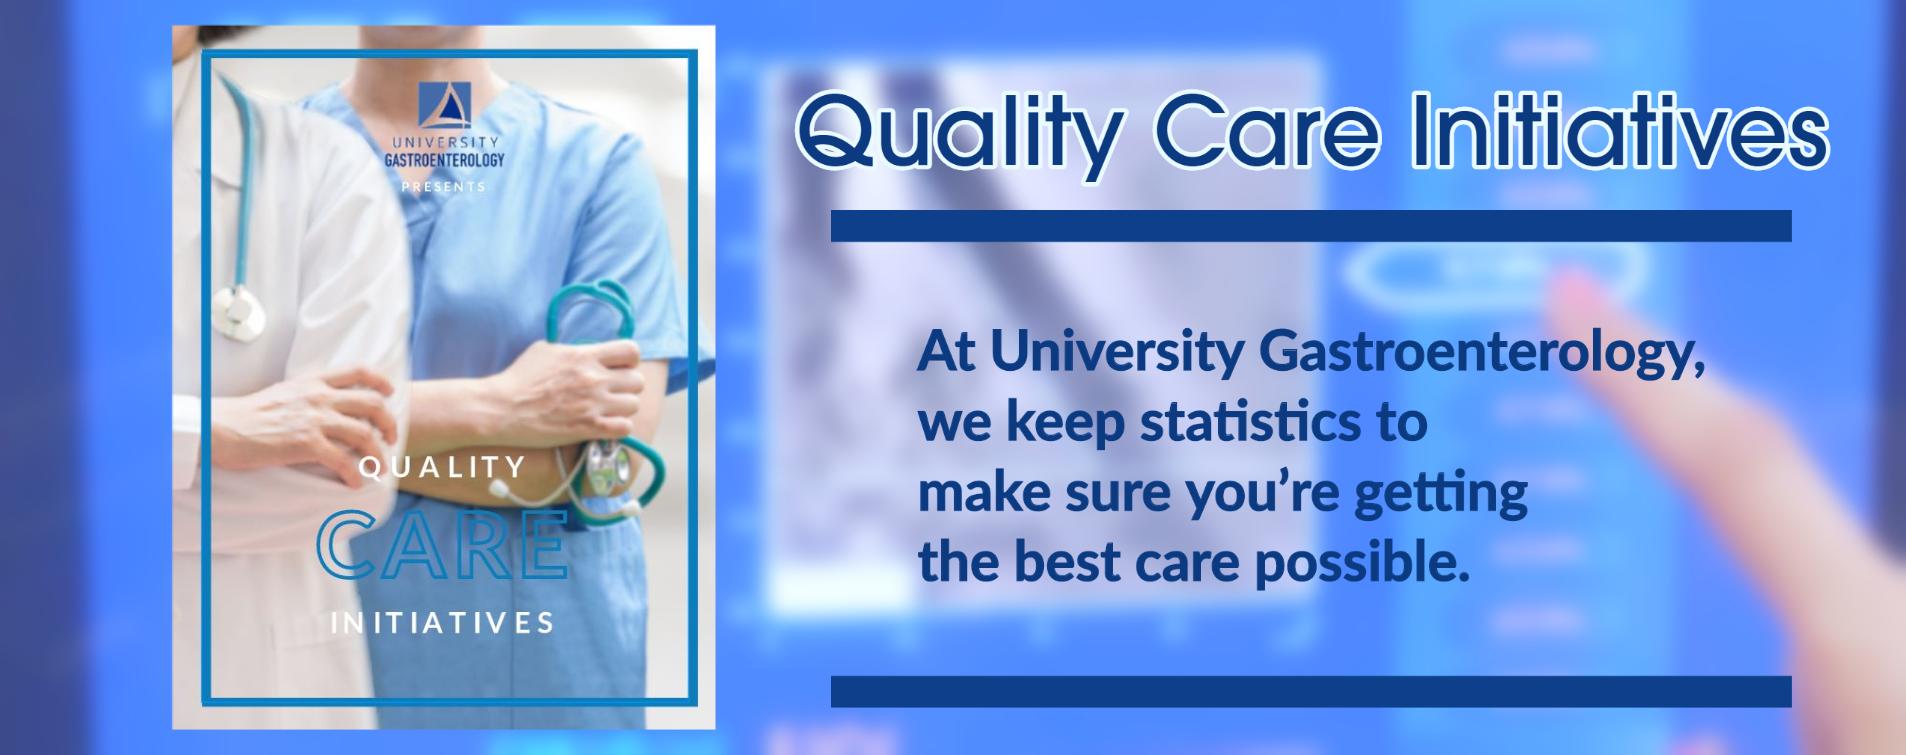 Quality Care Initiative